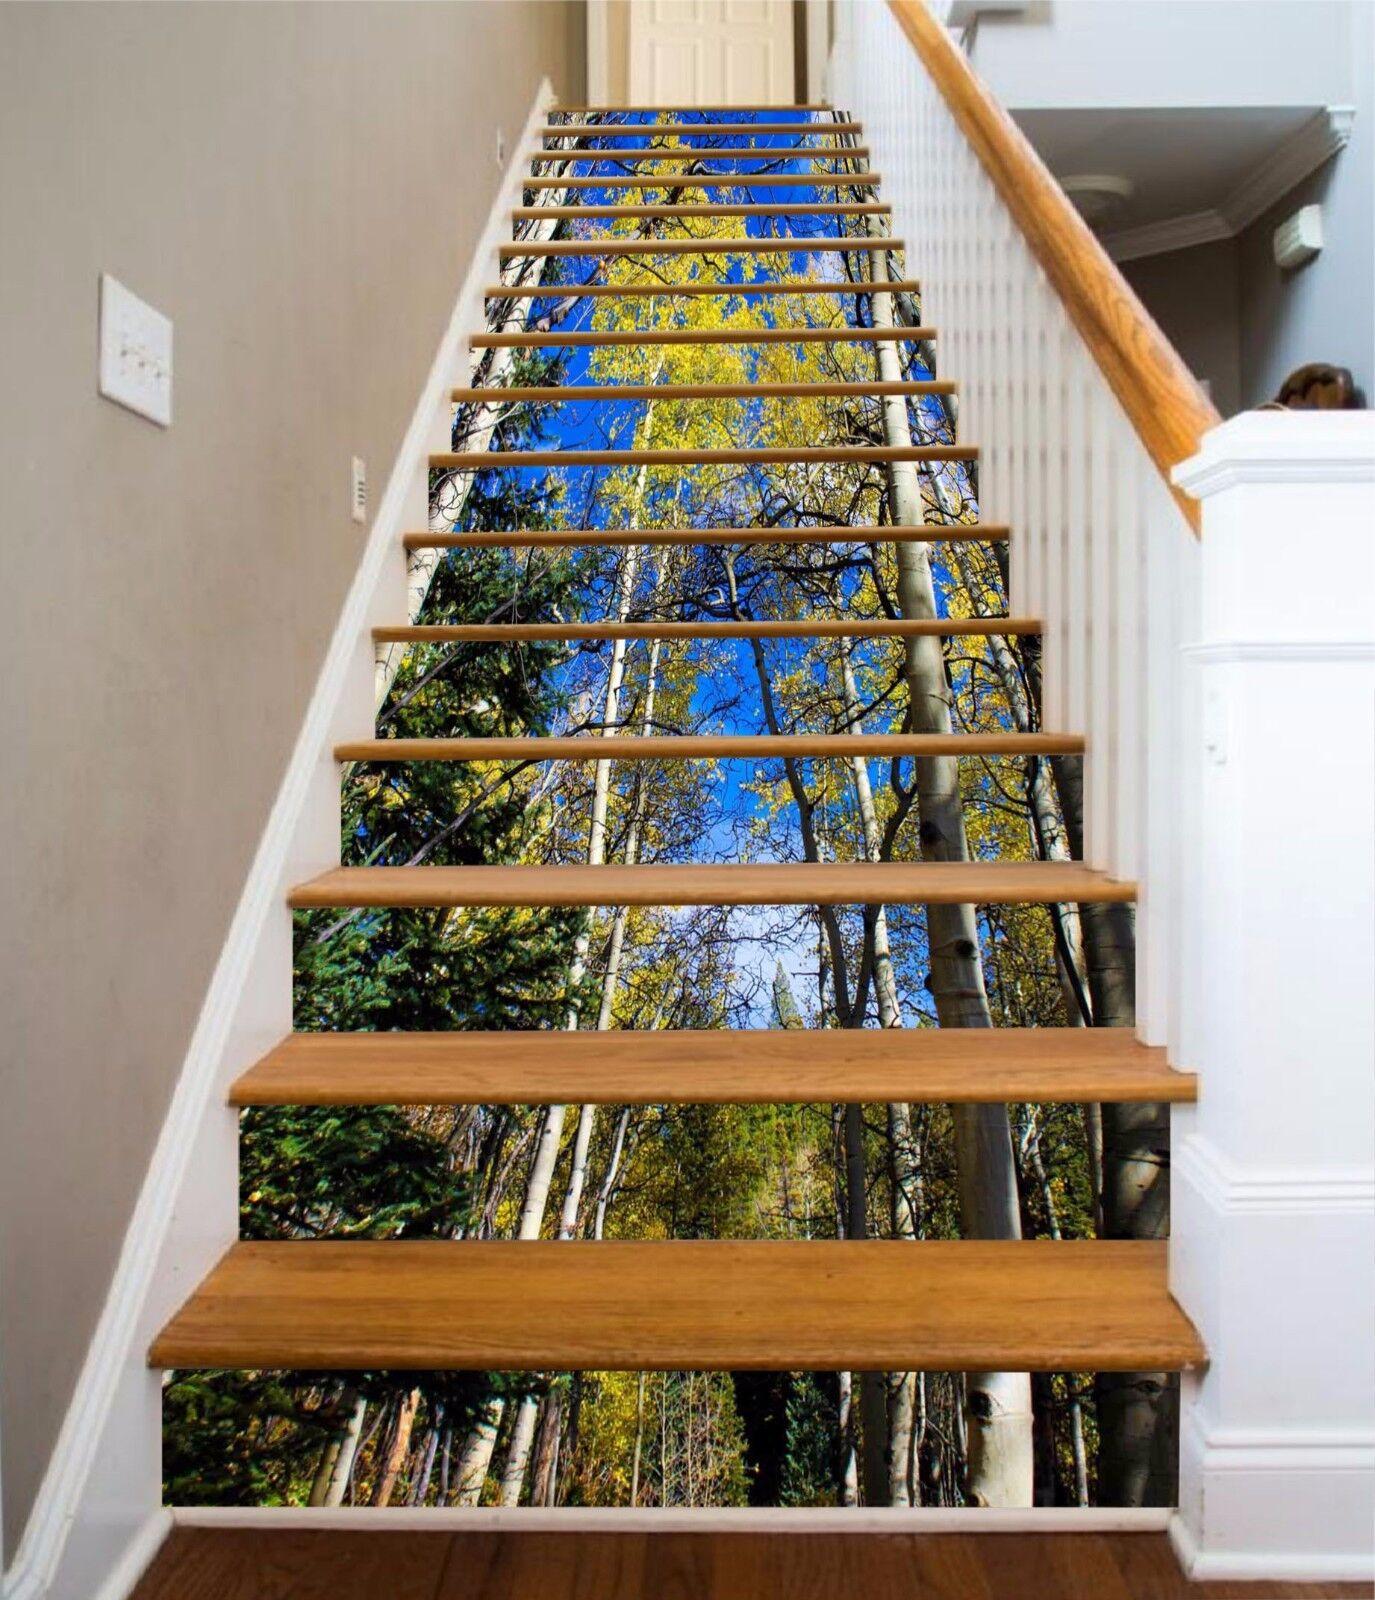 3D Sky Grove Stair Risers Decoration Photo Mural Vinyl Decal Wallpaper AU